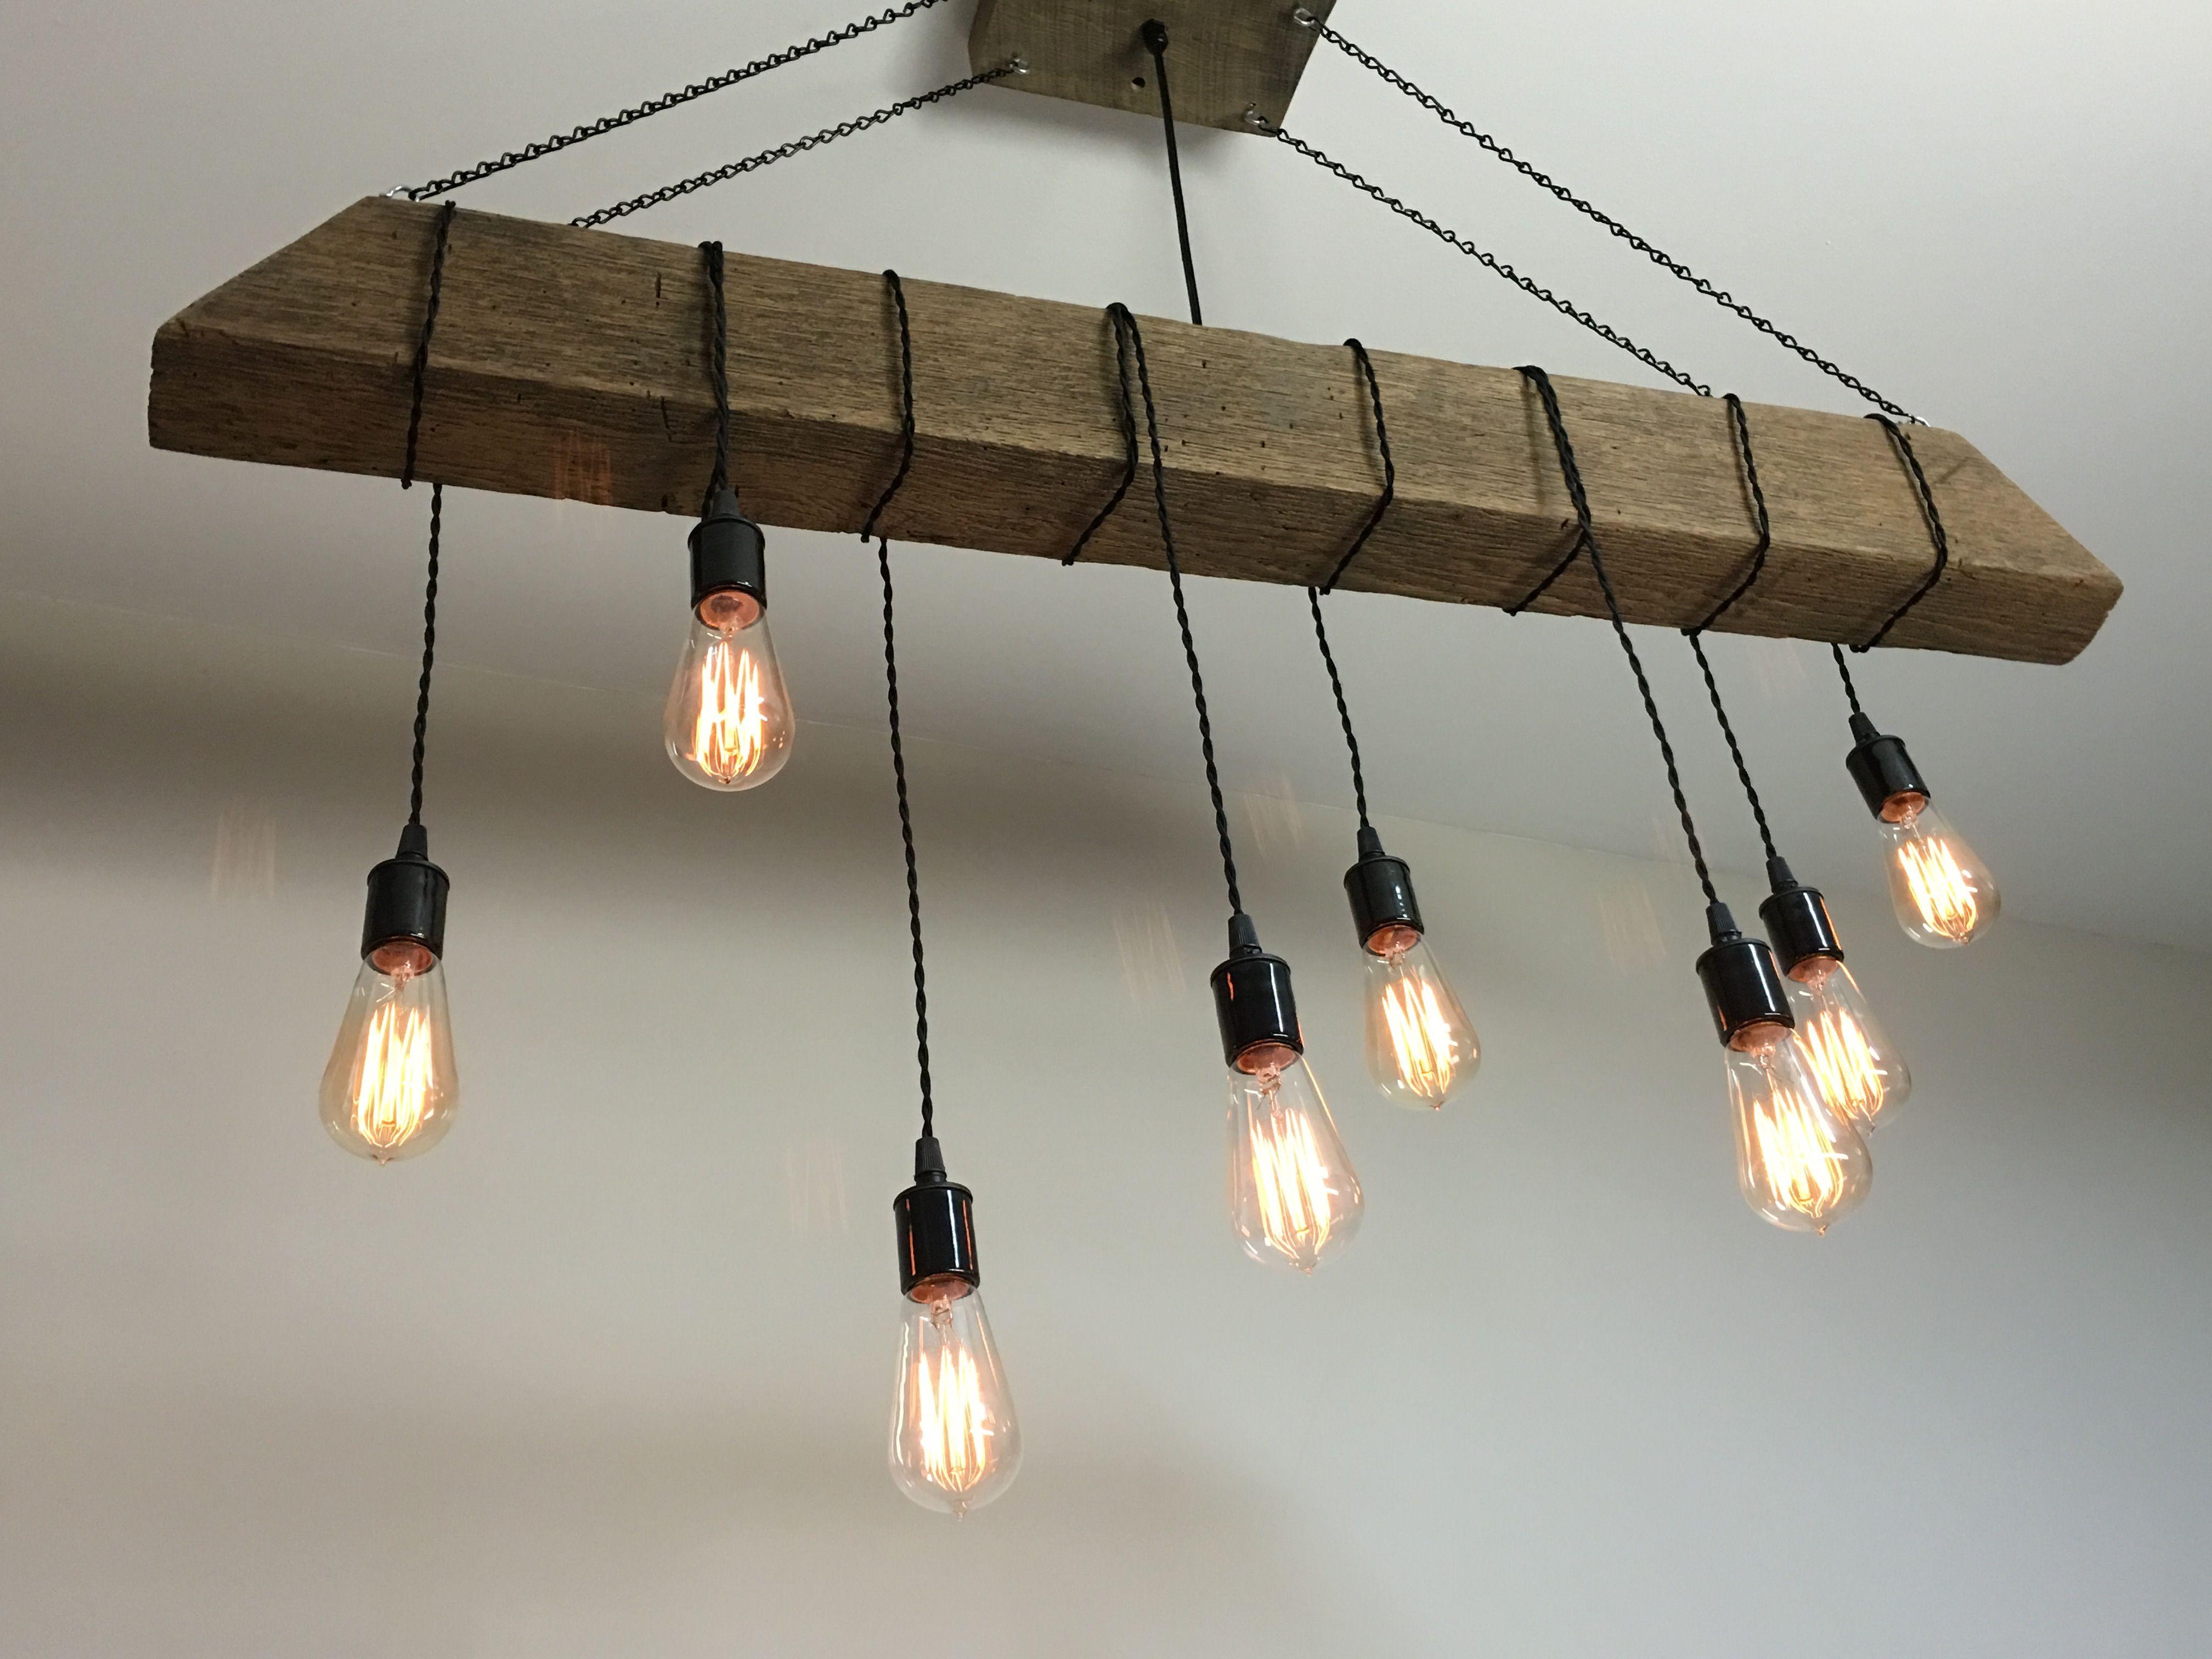 beam light fixture bar restaurant home edison bulb rustic modern. Black Bedroom Furniture Sets. Home Design Ideas